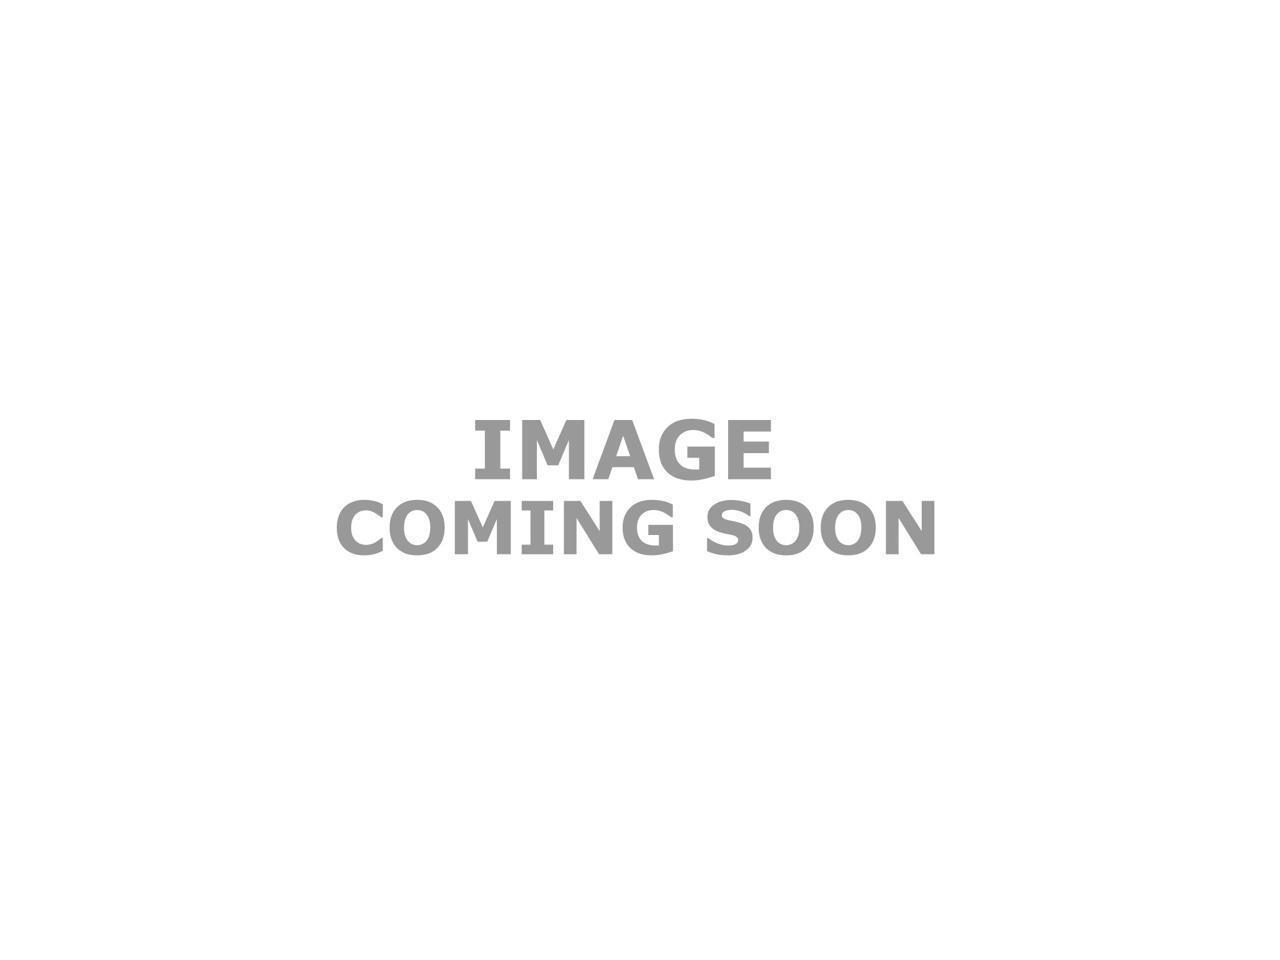 Garmin CV-23 TM 4-Pin Transducer for EchoMap Factory